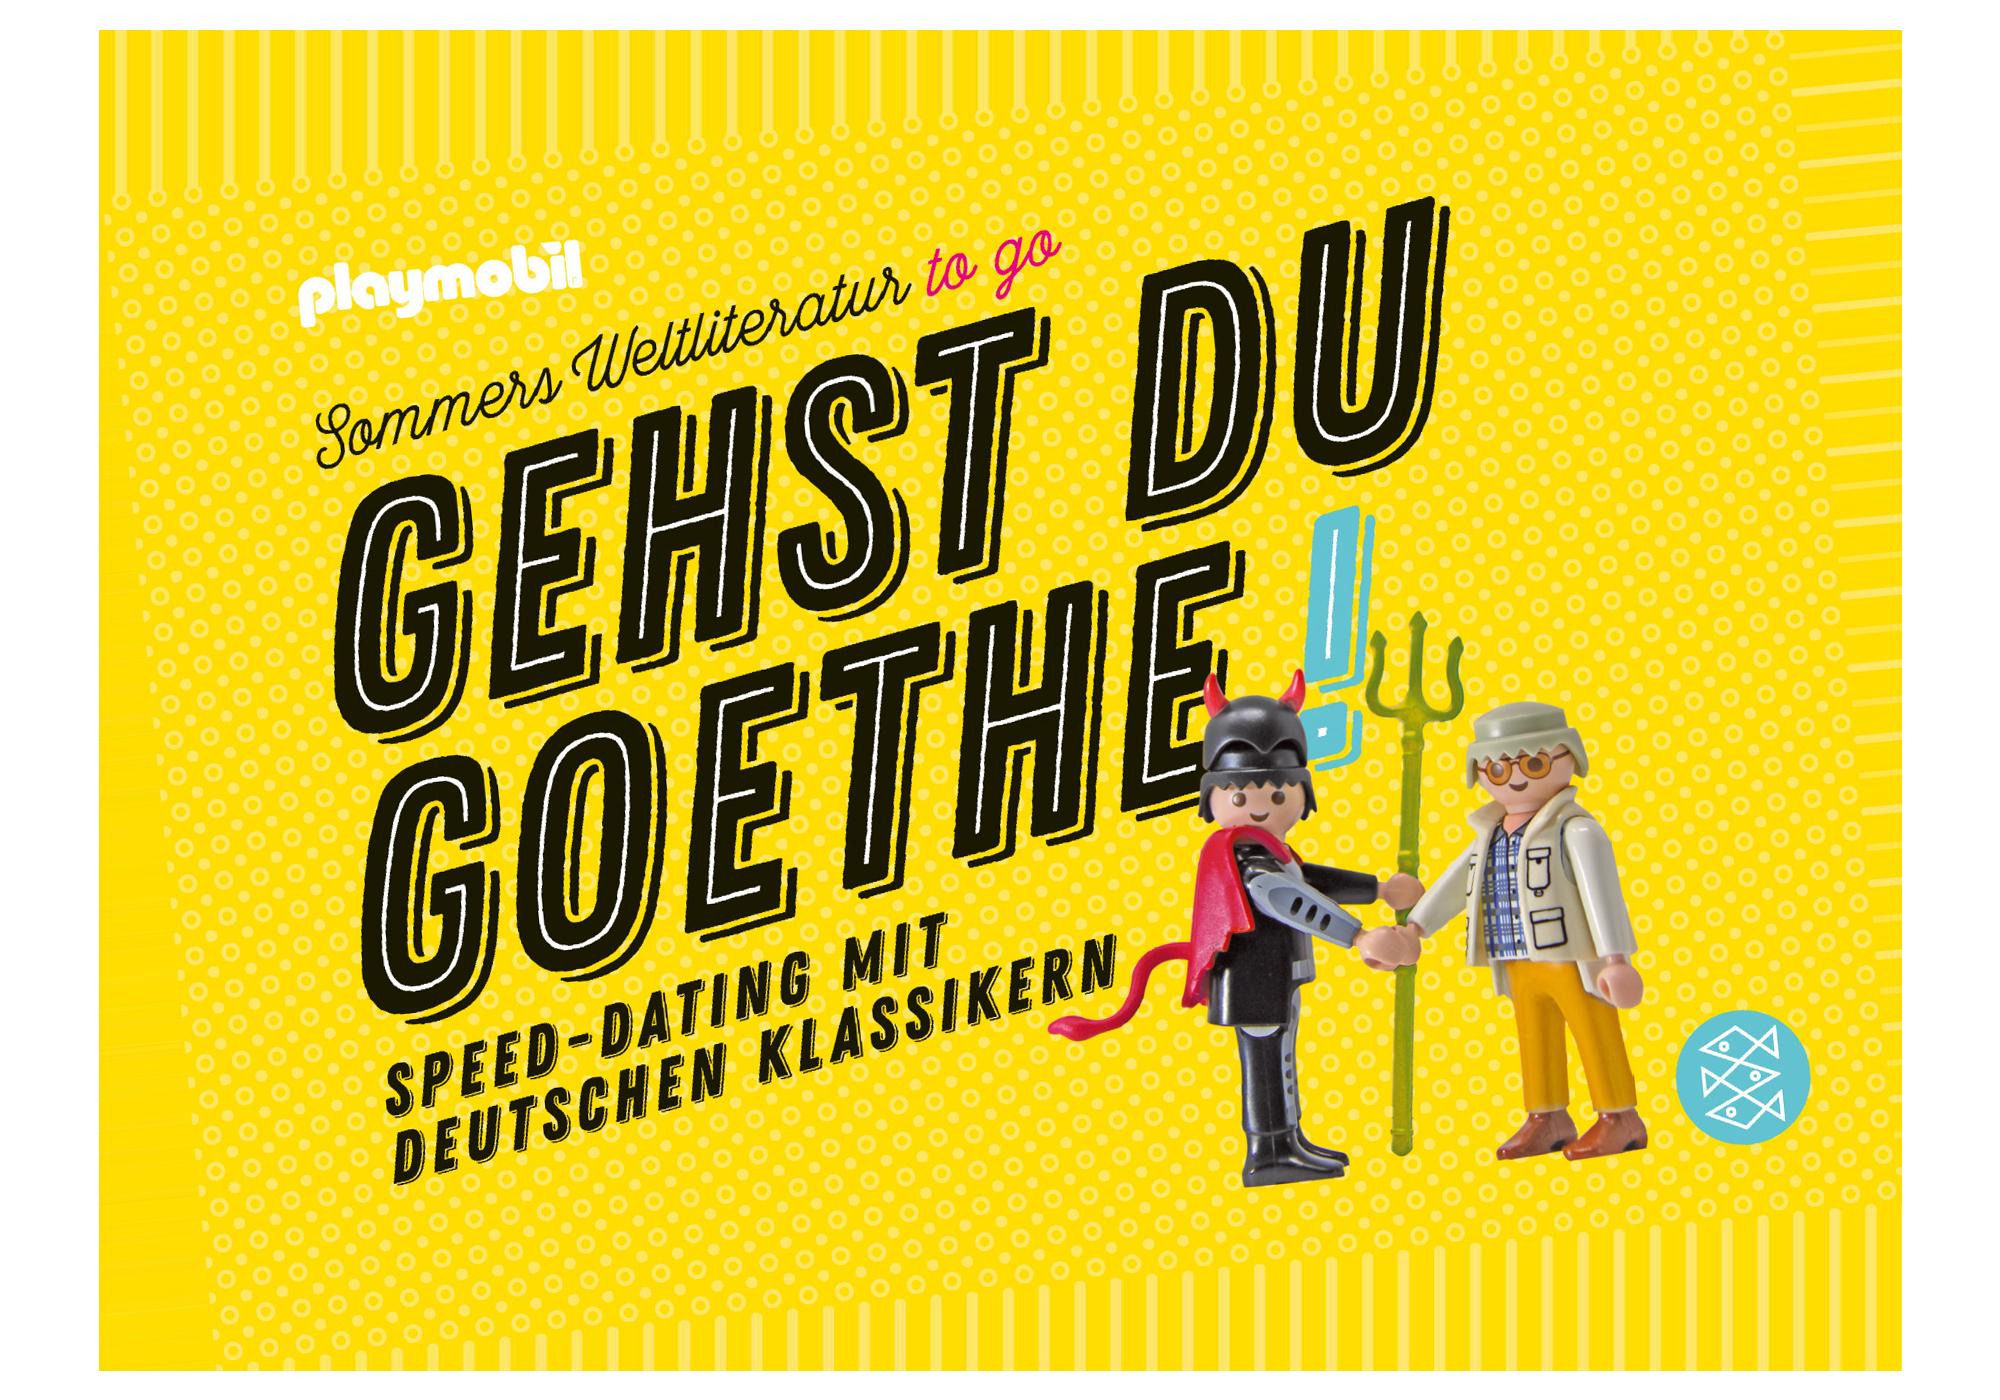 http://media.playmobil.com/i/playmobil/80289_product_detail/Gehst du Goethe! Speed-Dating mit deutschen Klassikern